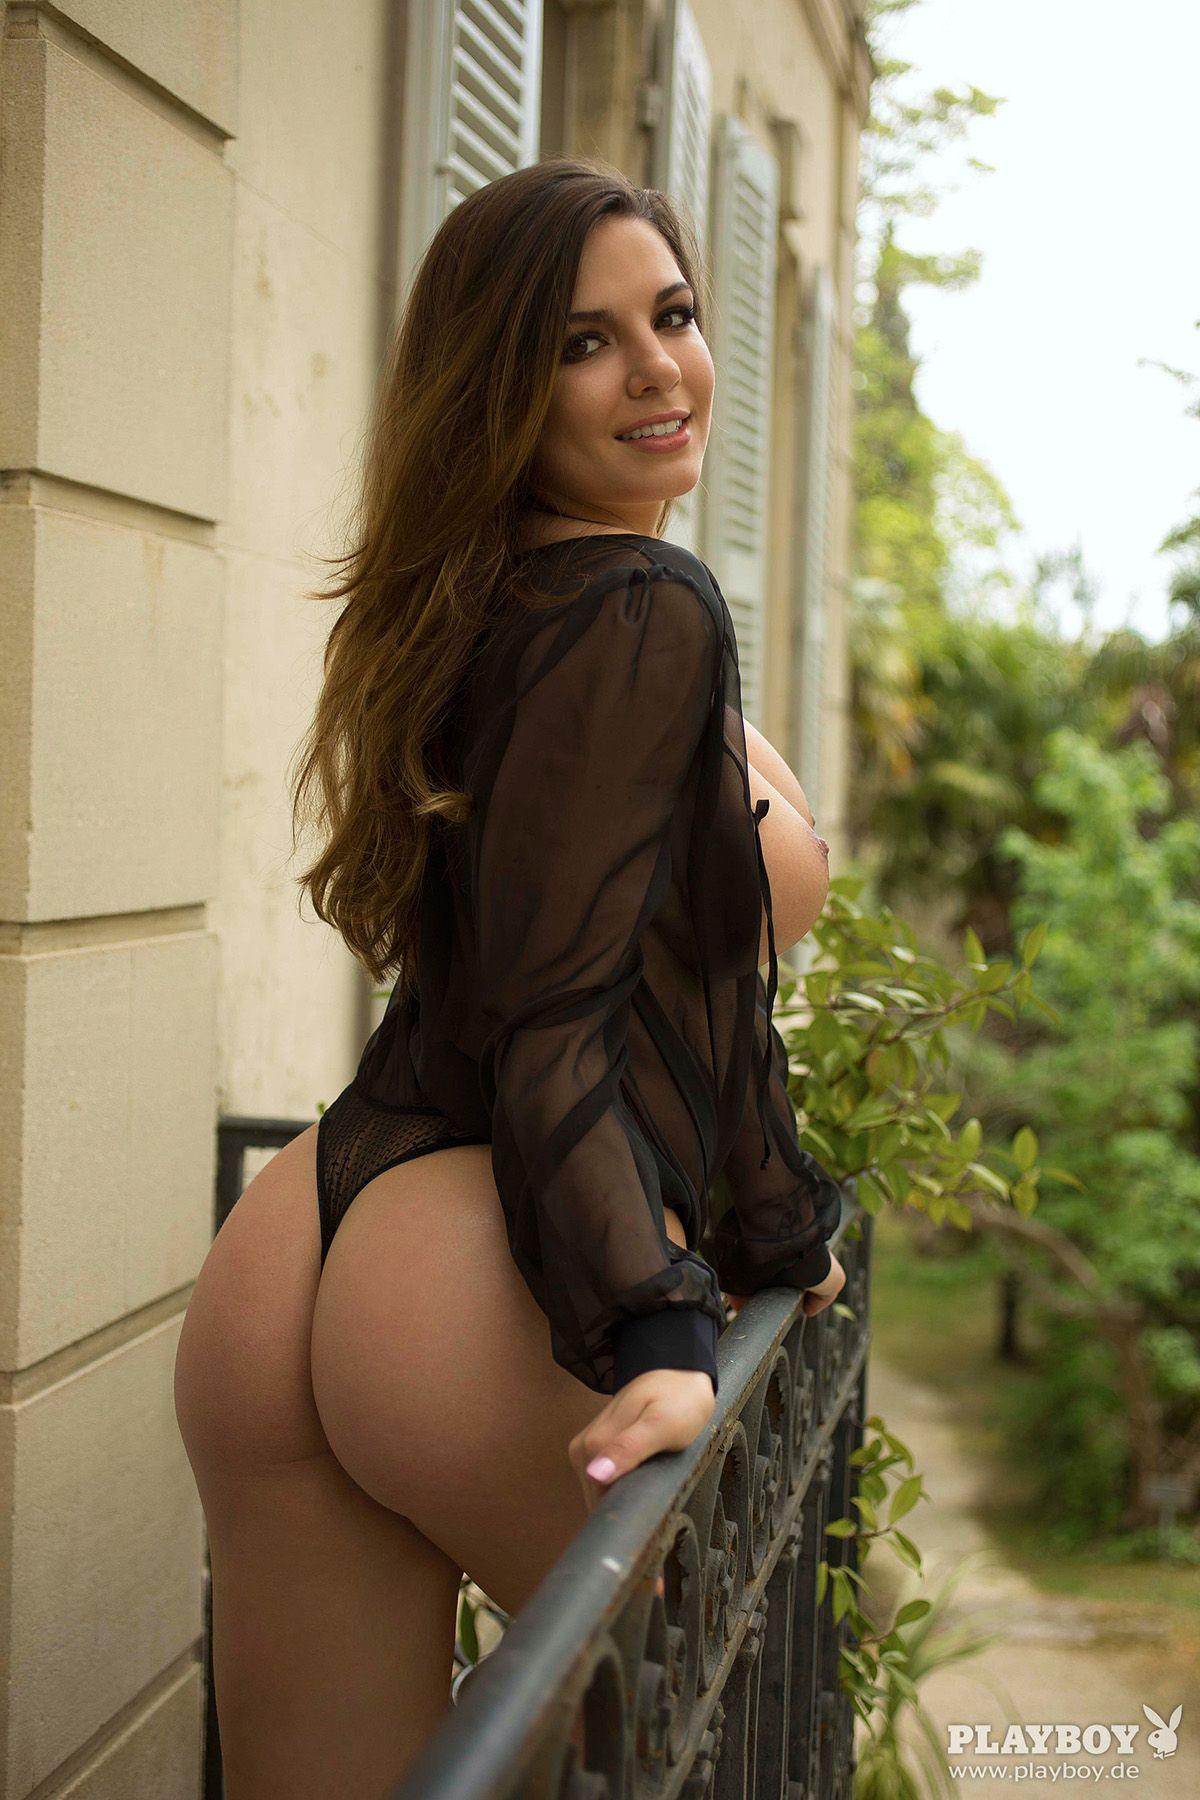 jessica ashley sexy big tits nude photos – big boobs photos